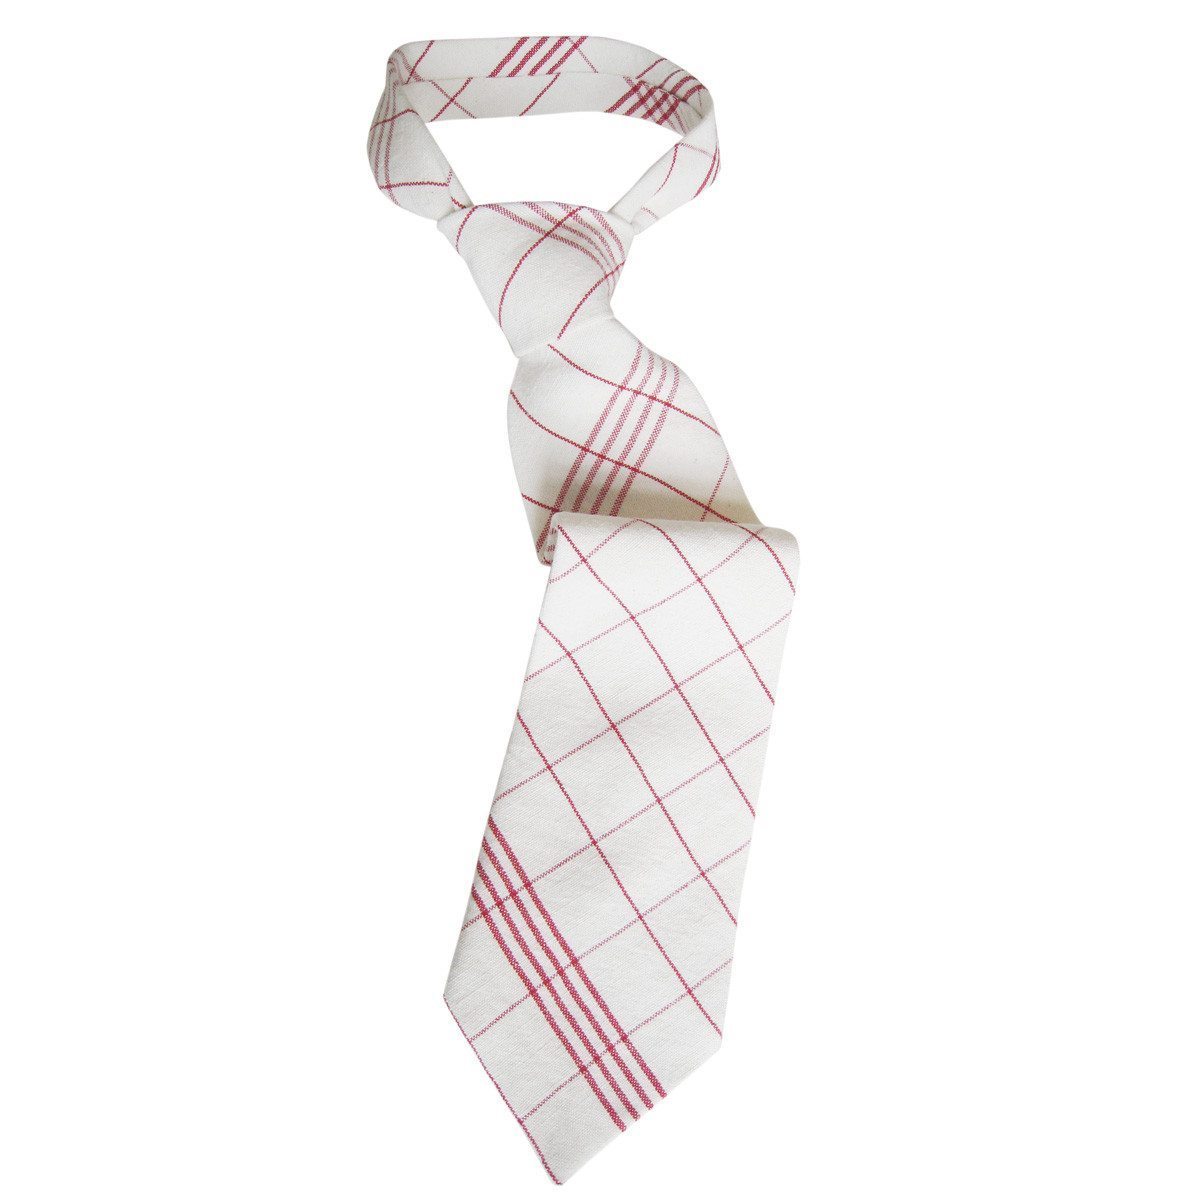 Puhdistusliina solmio